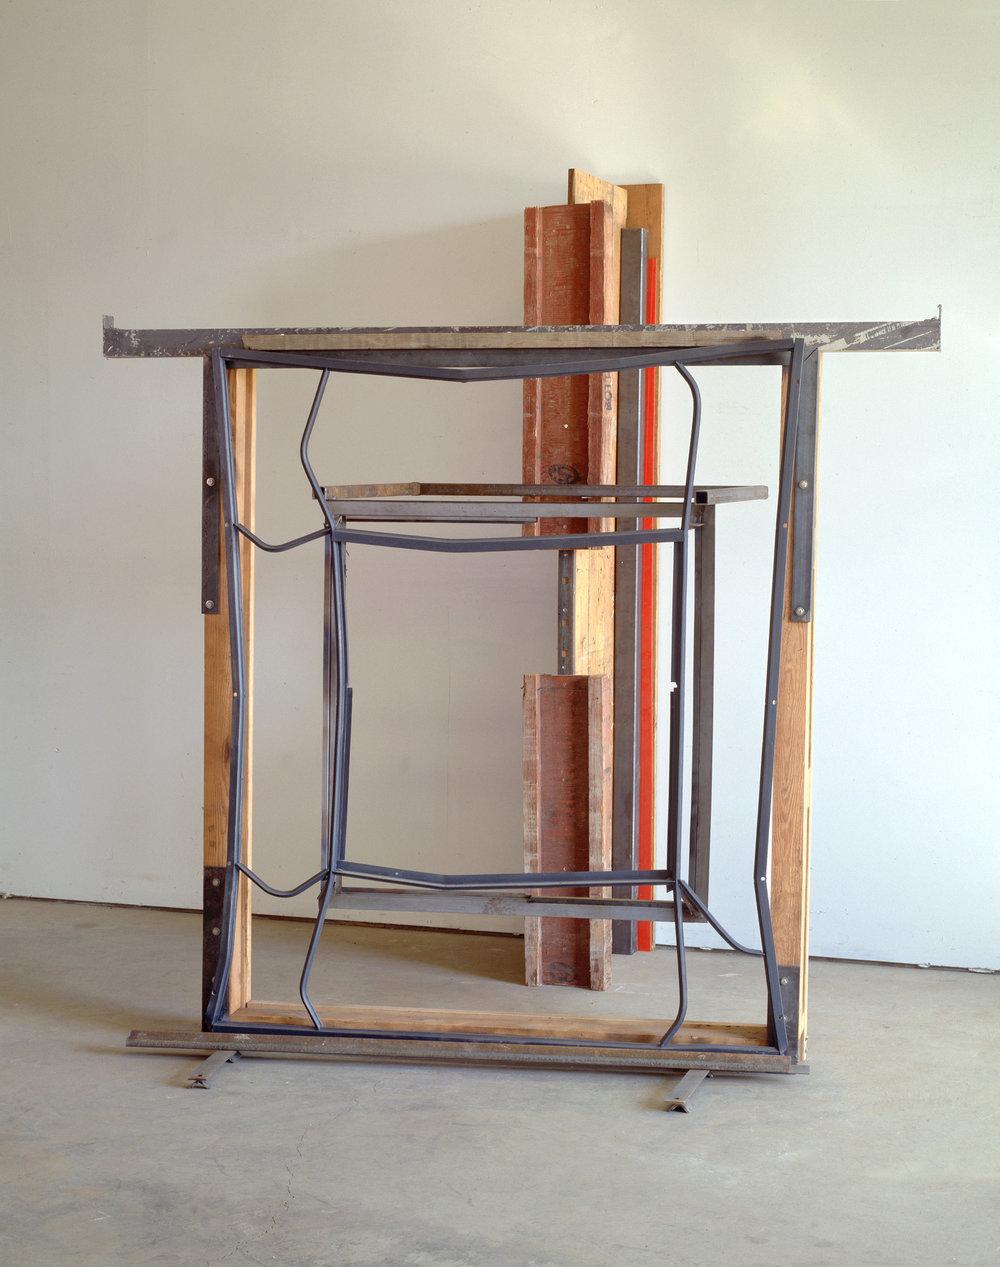 "Index      1990-95   h.100 3/4  "" x w.91 1/4"" x d. 85""  Wood, steel, stainless steel,aluminum, plexiglas"